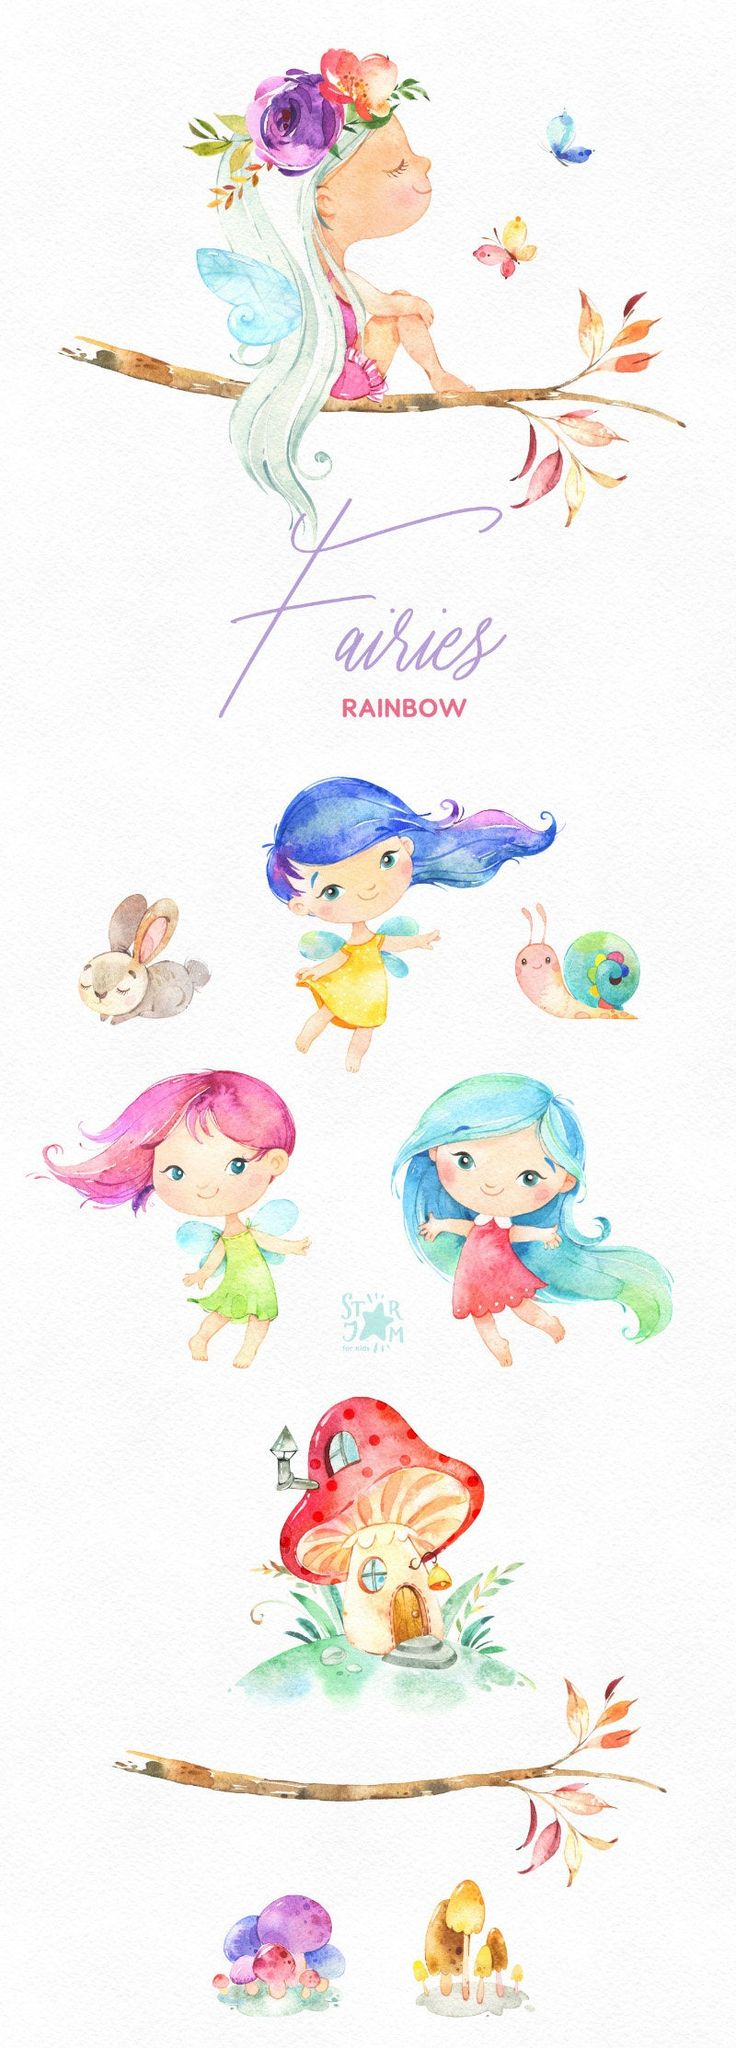 Regenbogen-Feen. Aquarell magische Cliparts, kleine Mädchen, Haare, Pilze, Wald, Märchen, Blumen, Blumen, Kindergarten, Babys, Babyparty